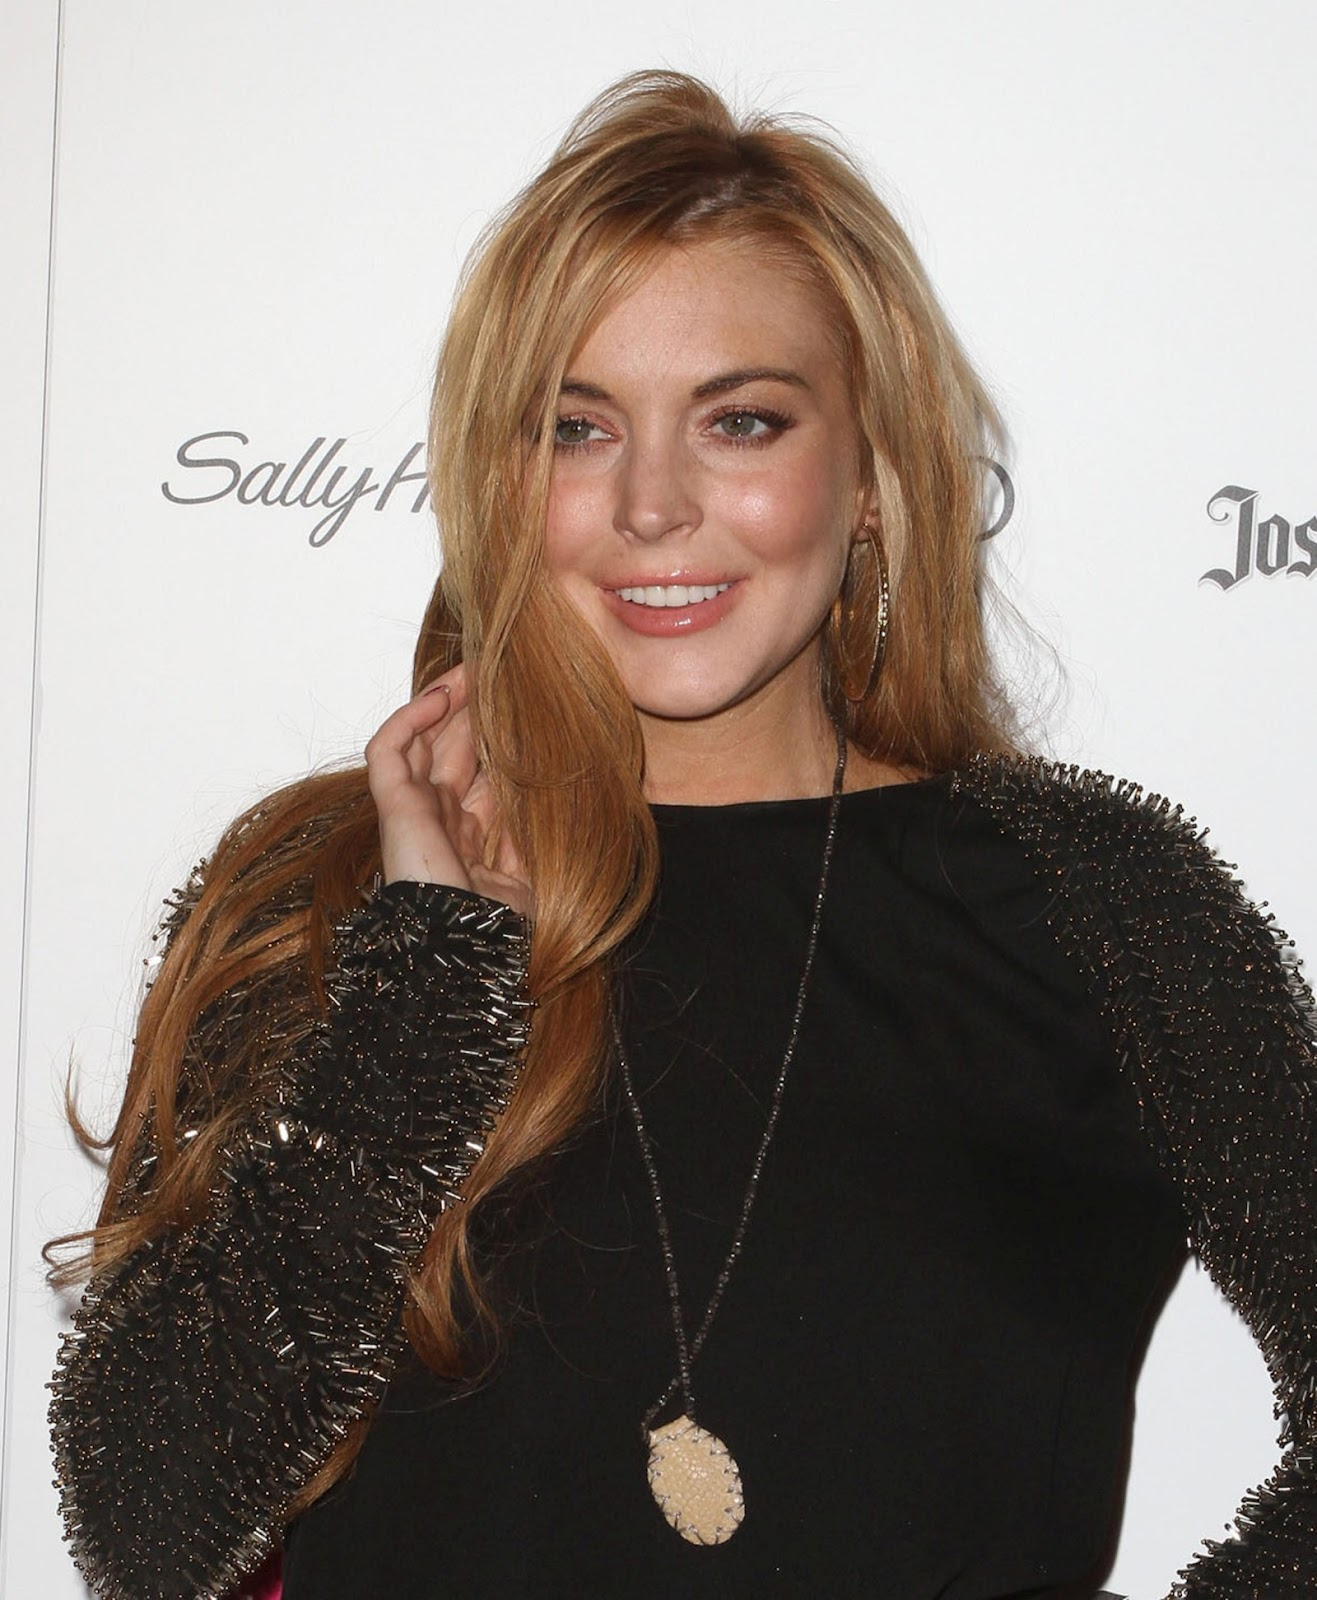 http://1.bp.blogspot.com/-uJRoKMrAdSw/T5sEZWeBDjI/AAAAAAAAChQ/5Fkf5AeMNZo/s1600/Lindsay_Lohan_Star_Magazine_All_Hollywood_event_2012-15.jpg